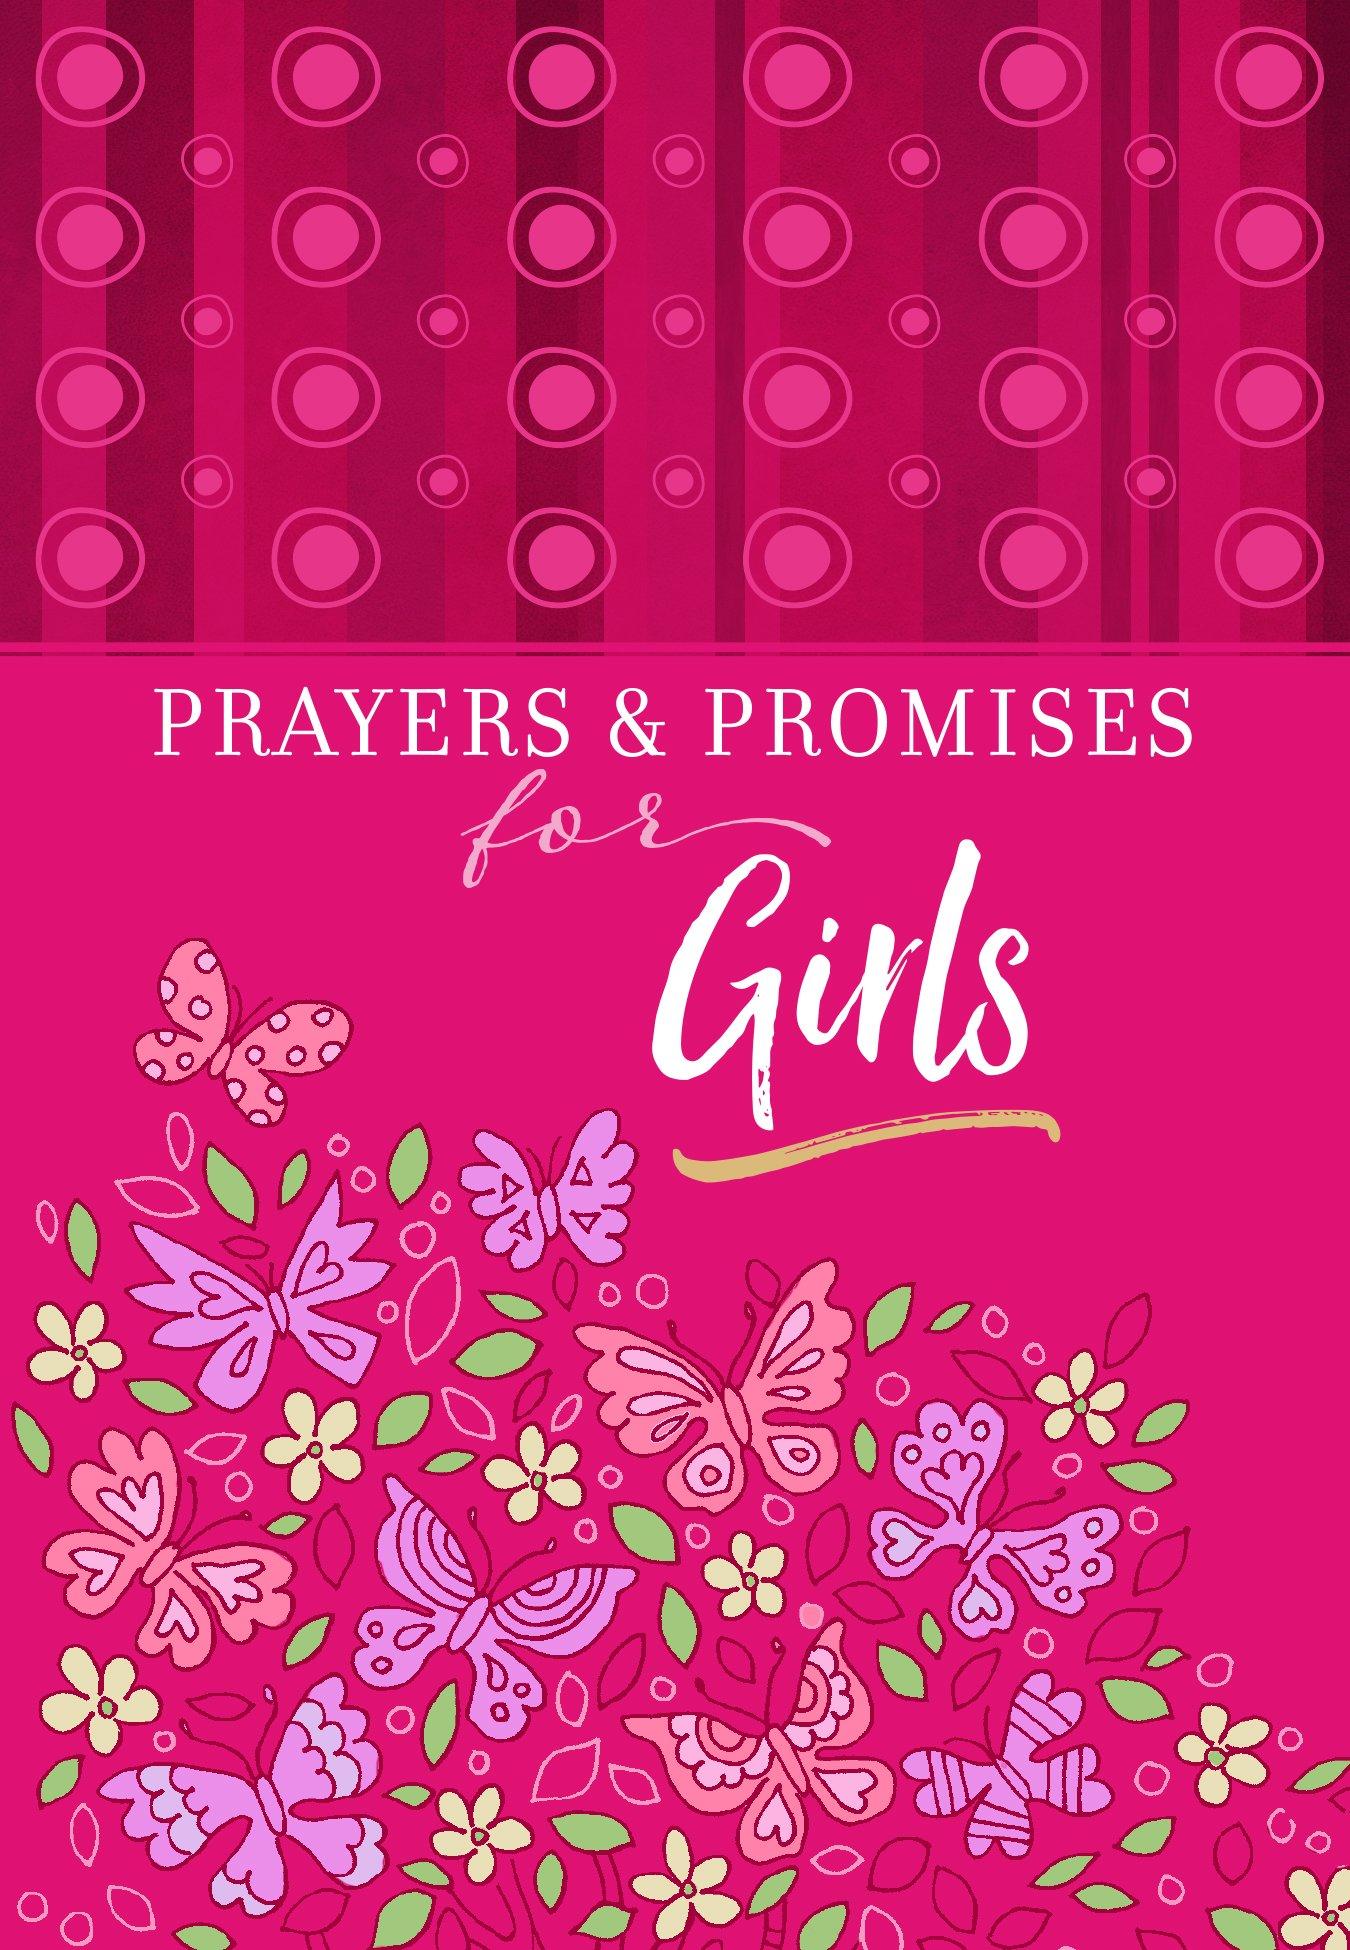 Prayers & Promises for Girls: BroadStreet Publishing Group LLC:  9781424556618: Amazon.com: Books